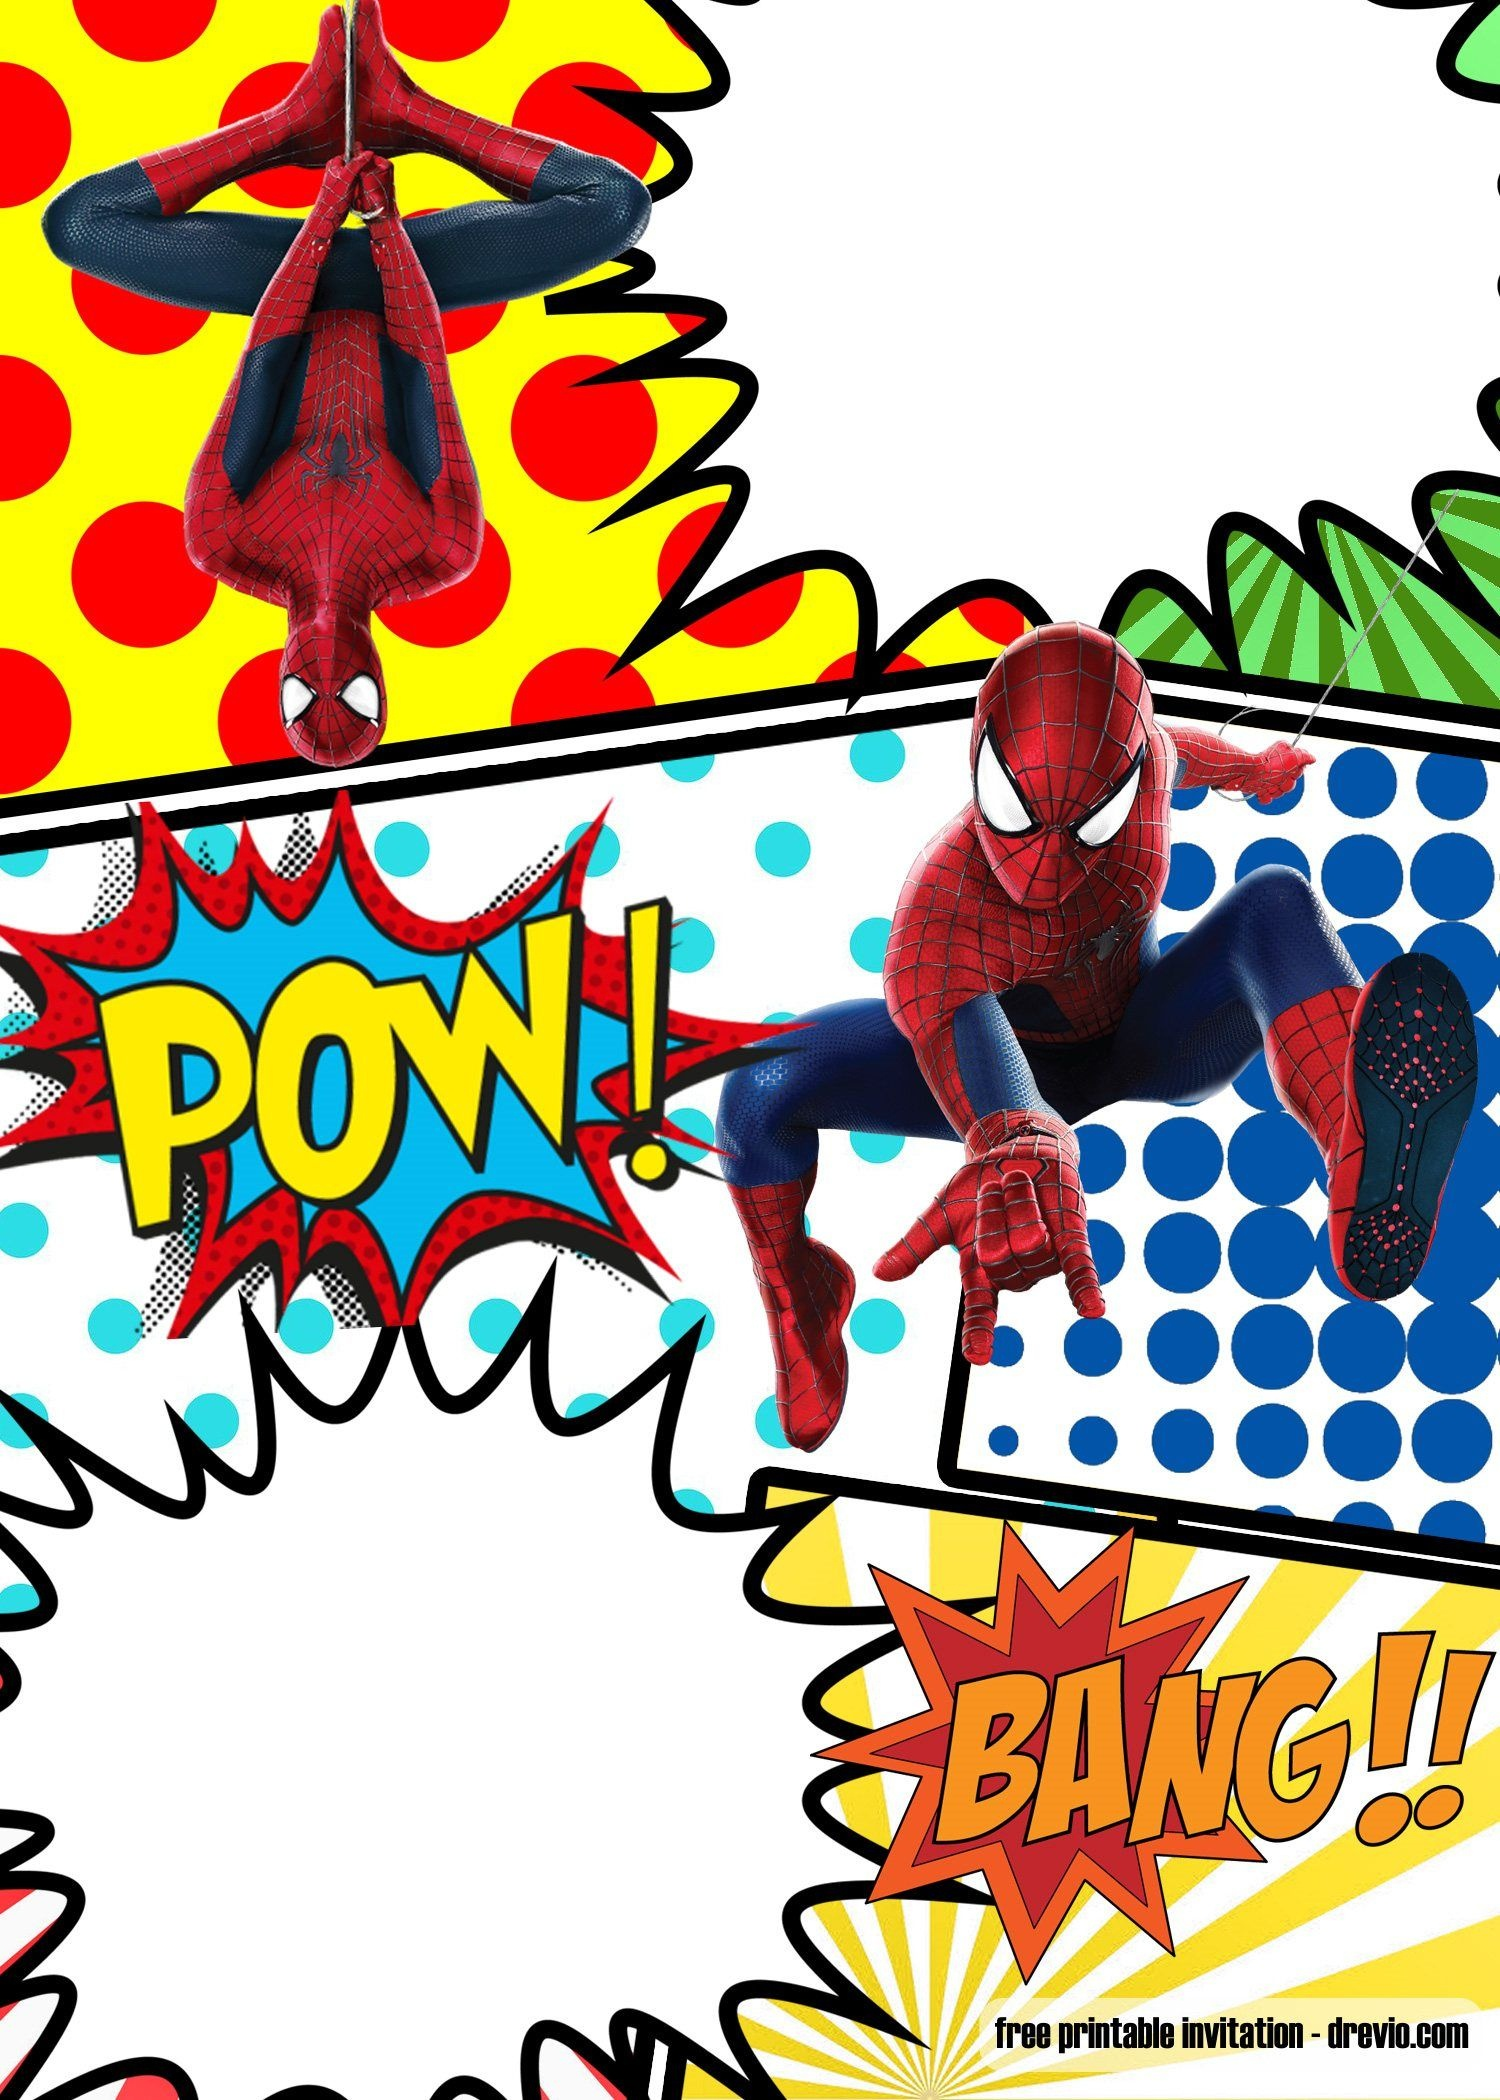 Free Marvel Spiderman Comic Style Invitation Template   Partying - Free Printable Superhero Birthday Invitation Templates